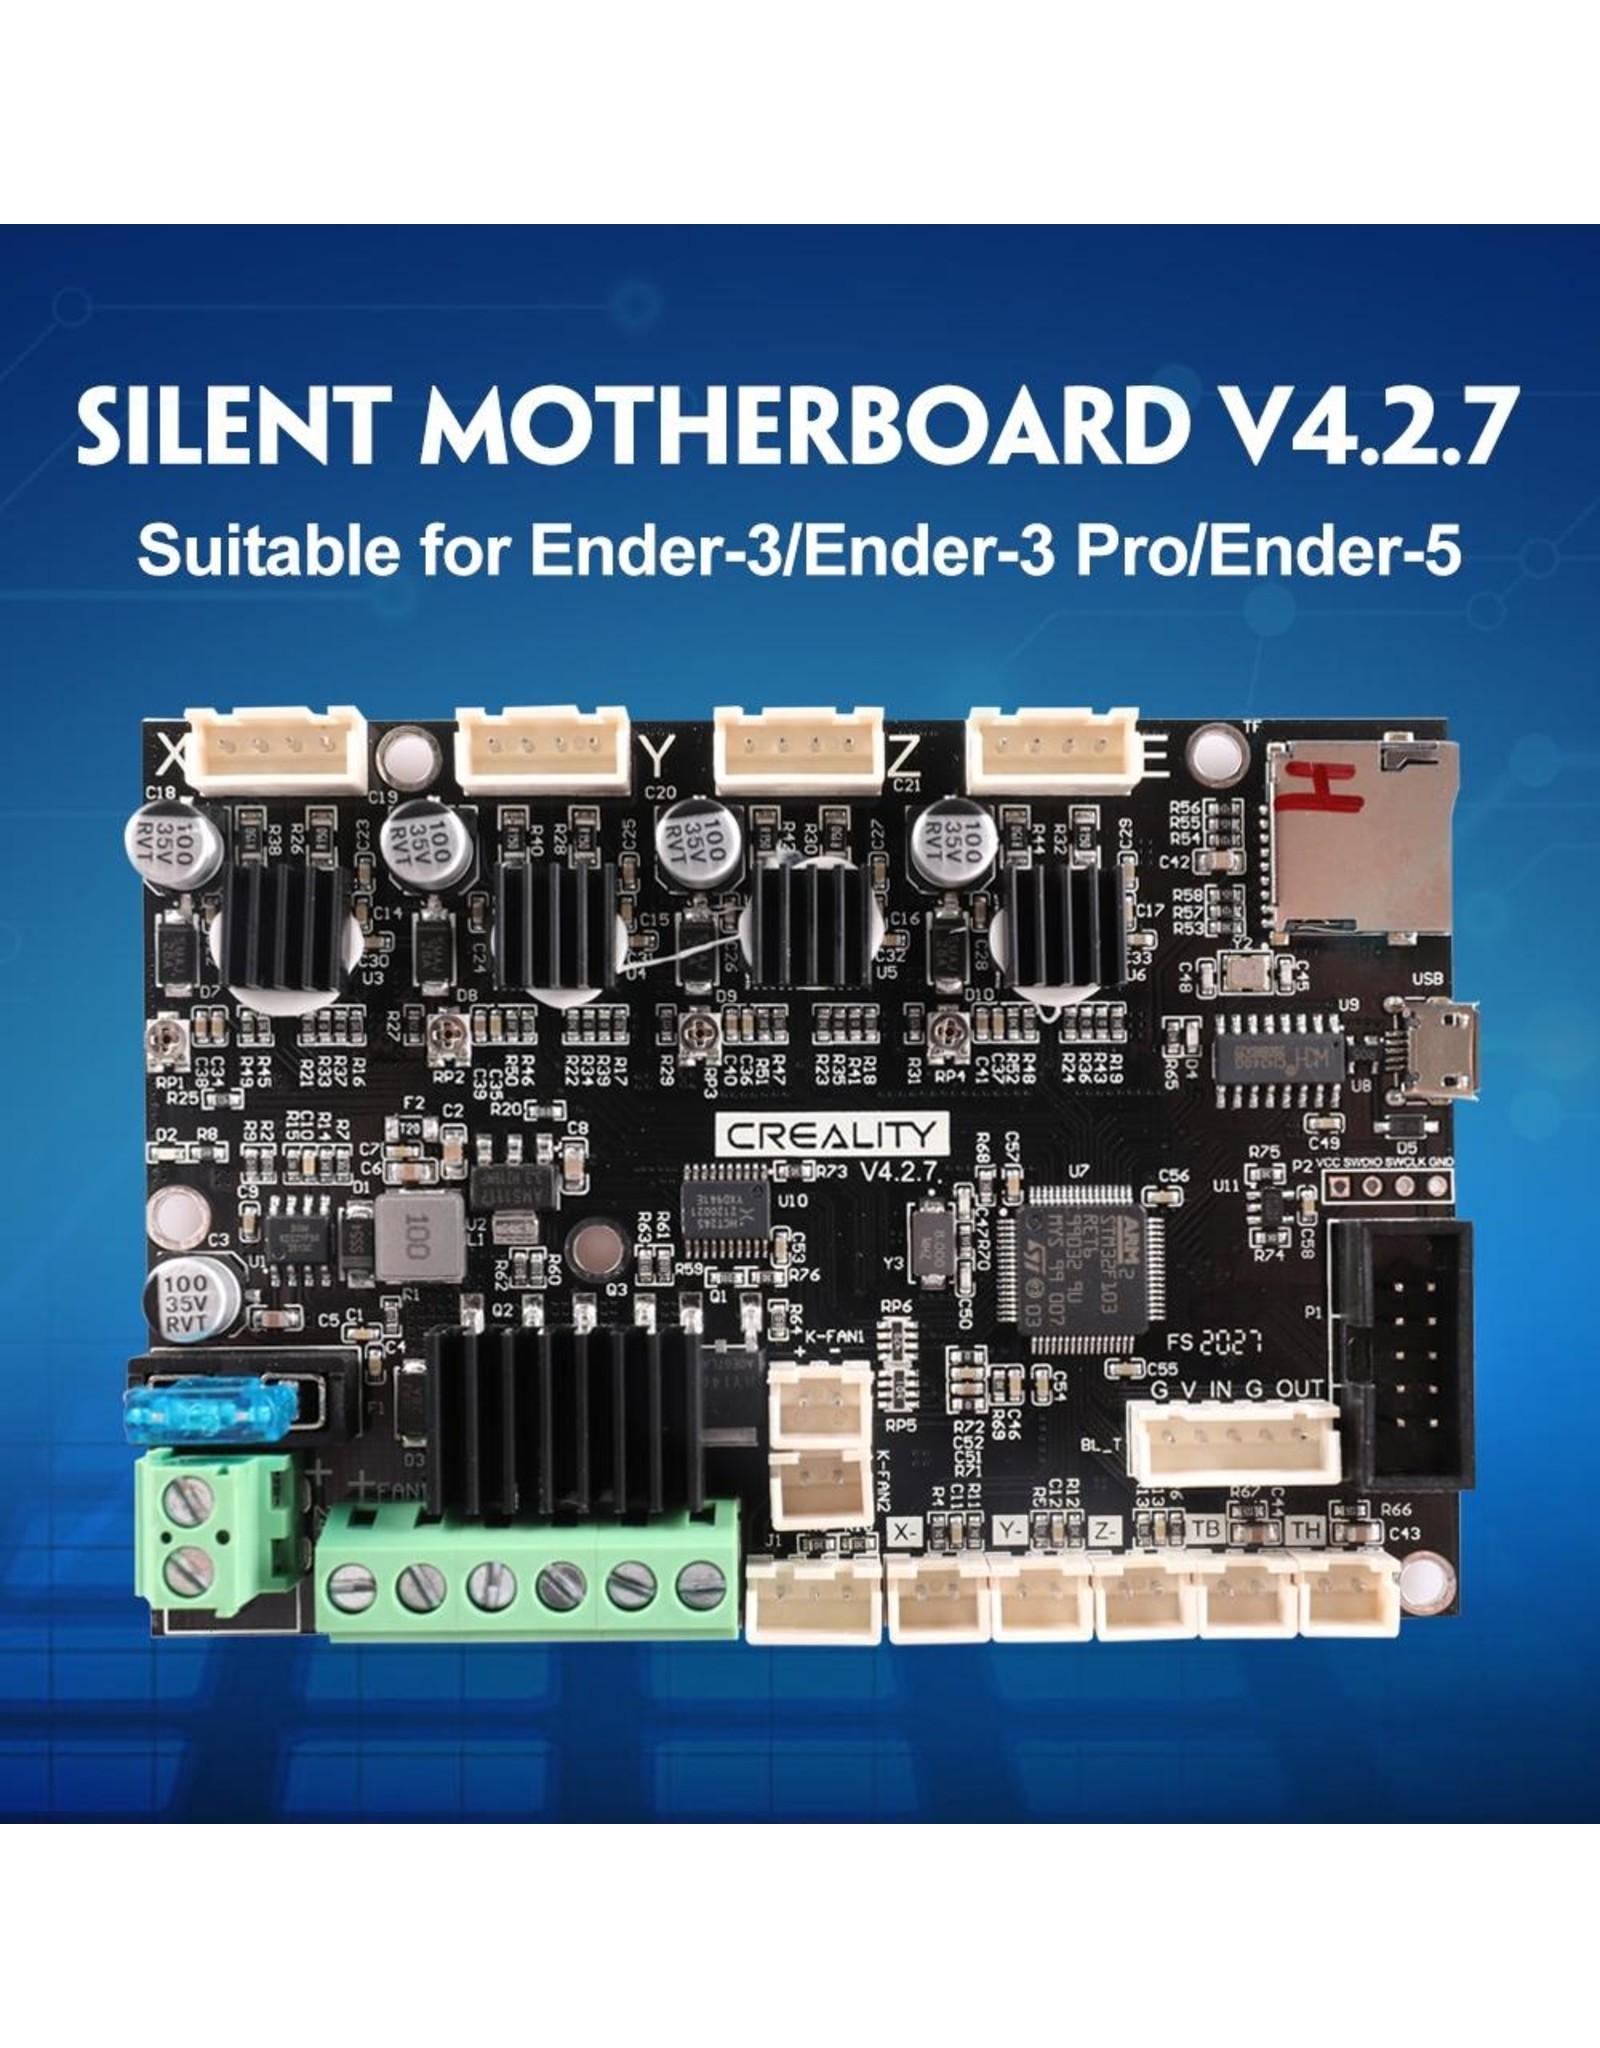 Creality/Ender Creality 3D Ender 3 - 3 Pro - 5 Silent Mainboard V4.2.7